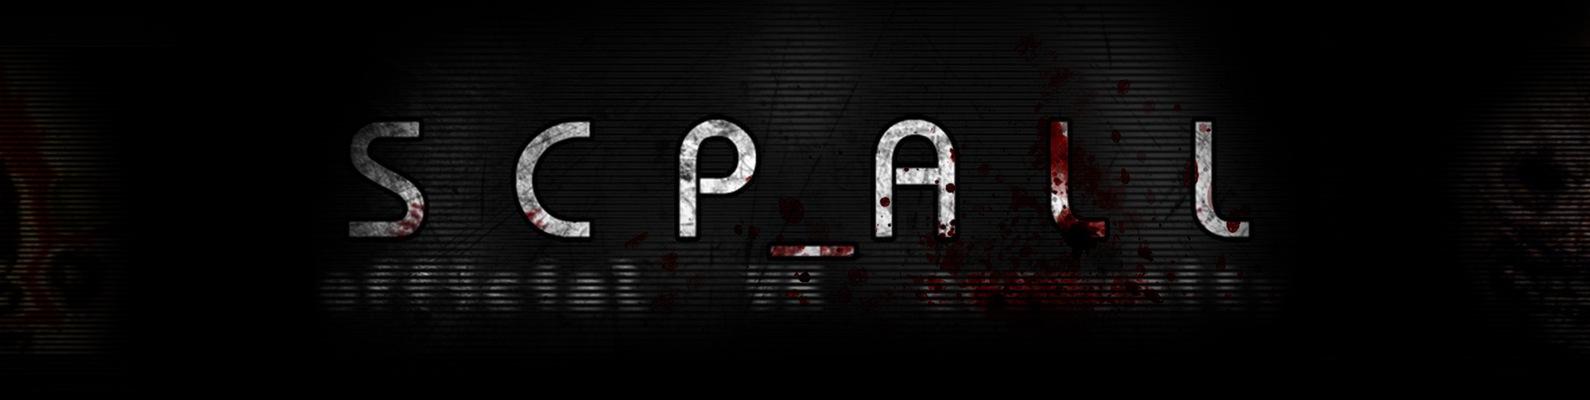 русификатор для scp containment breach 1 3 8 - Prakard